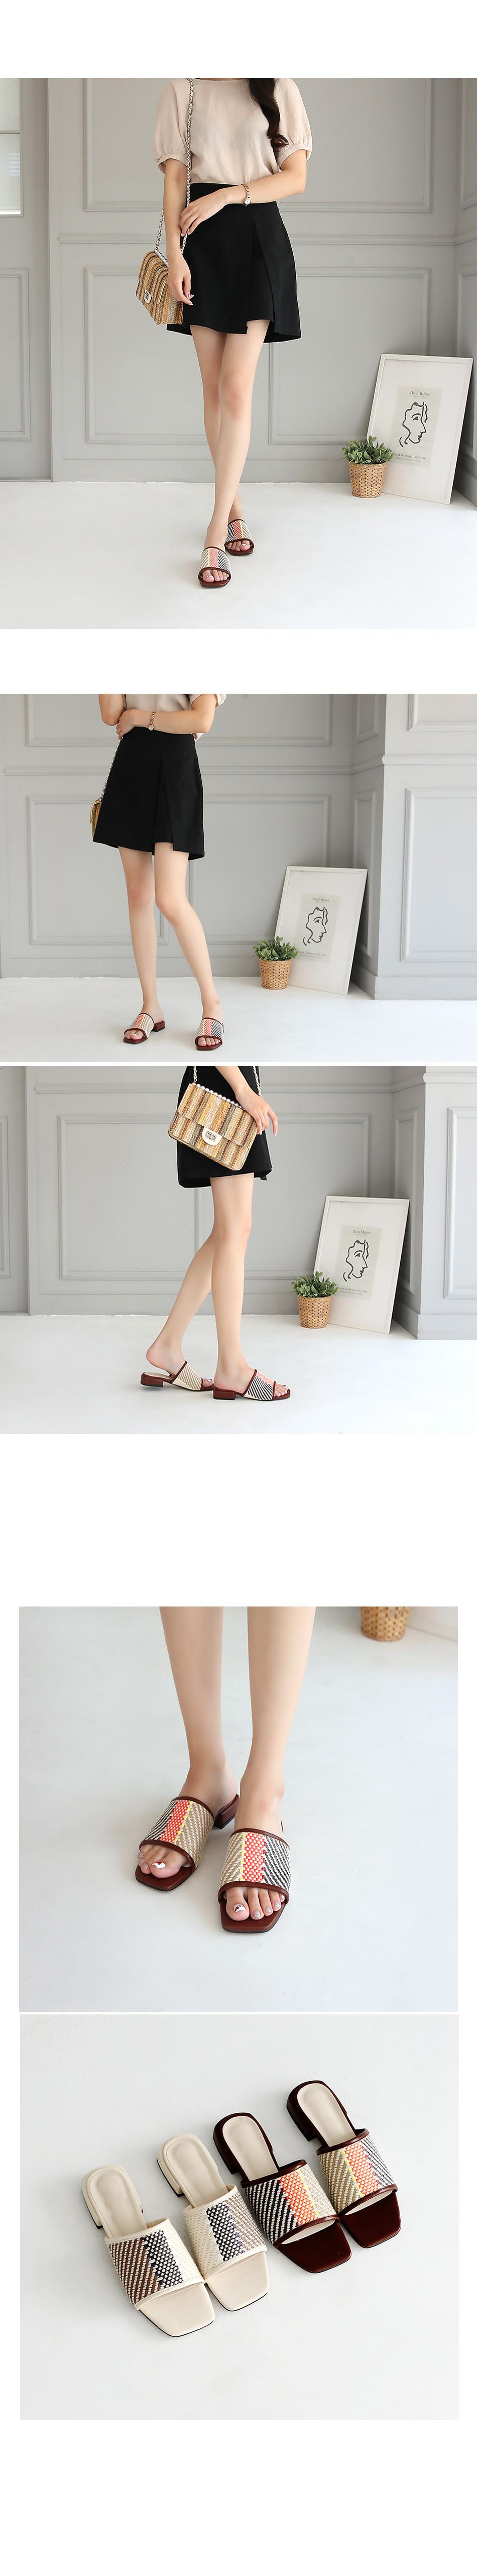 Thian Ratan Slippers 2cm